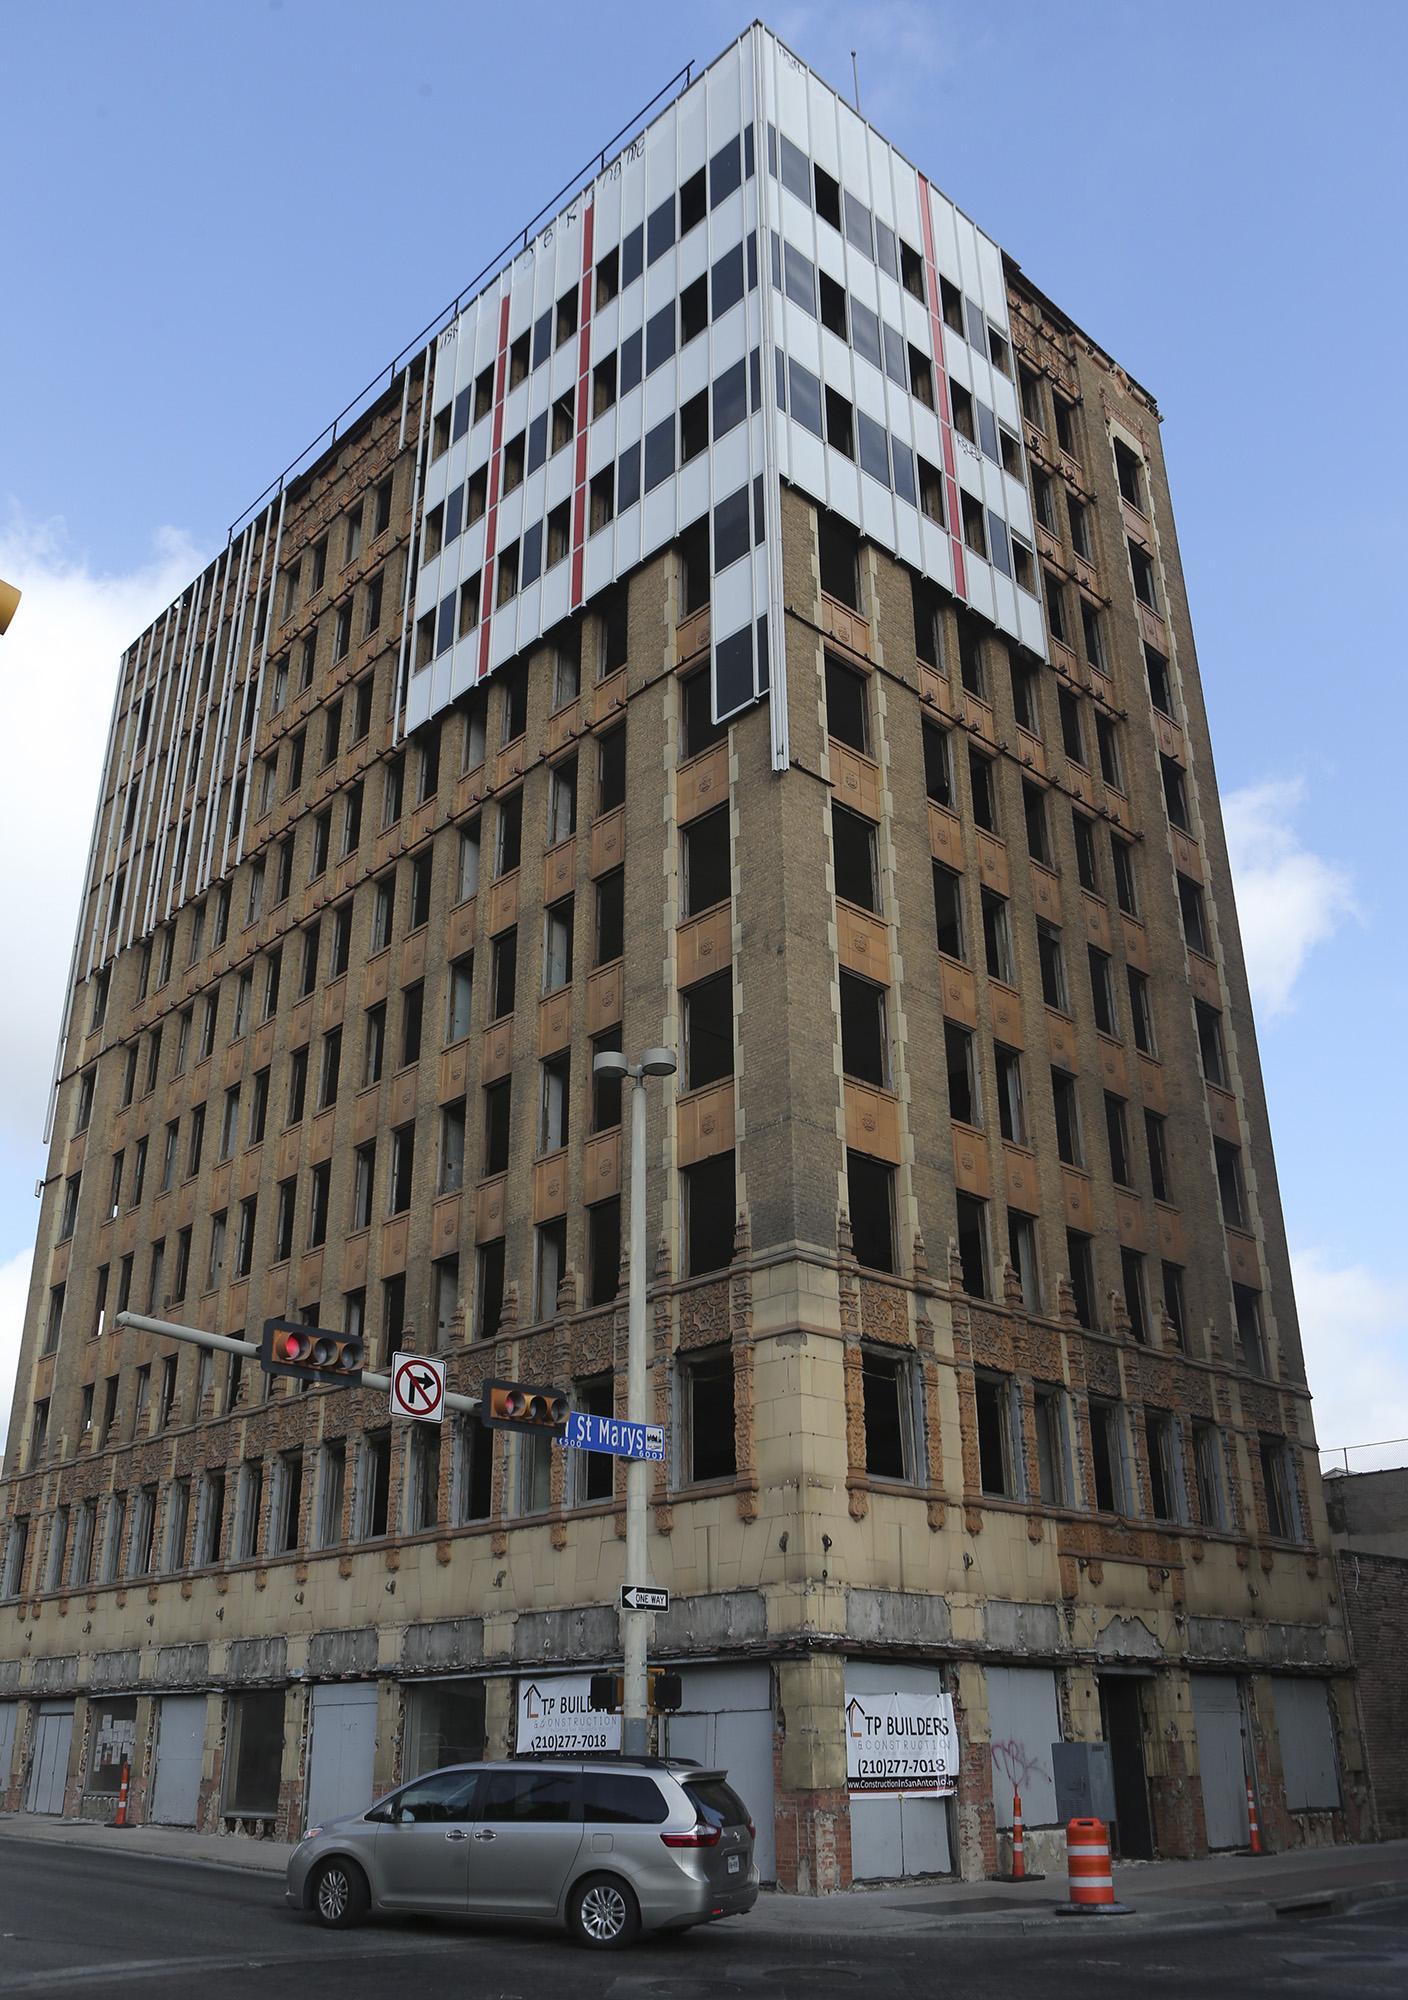 Historic Downtown San Antonio Hedrick Building Has Its